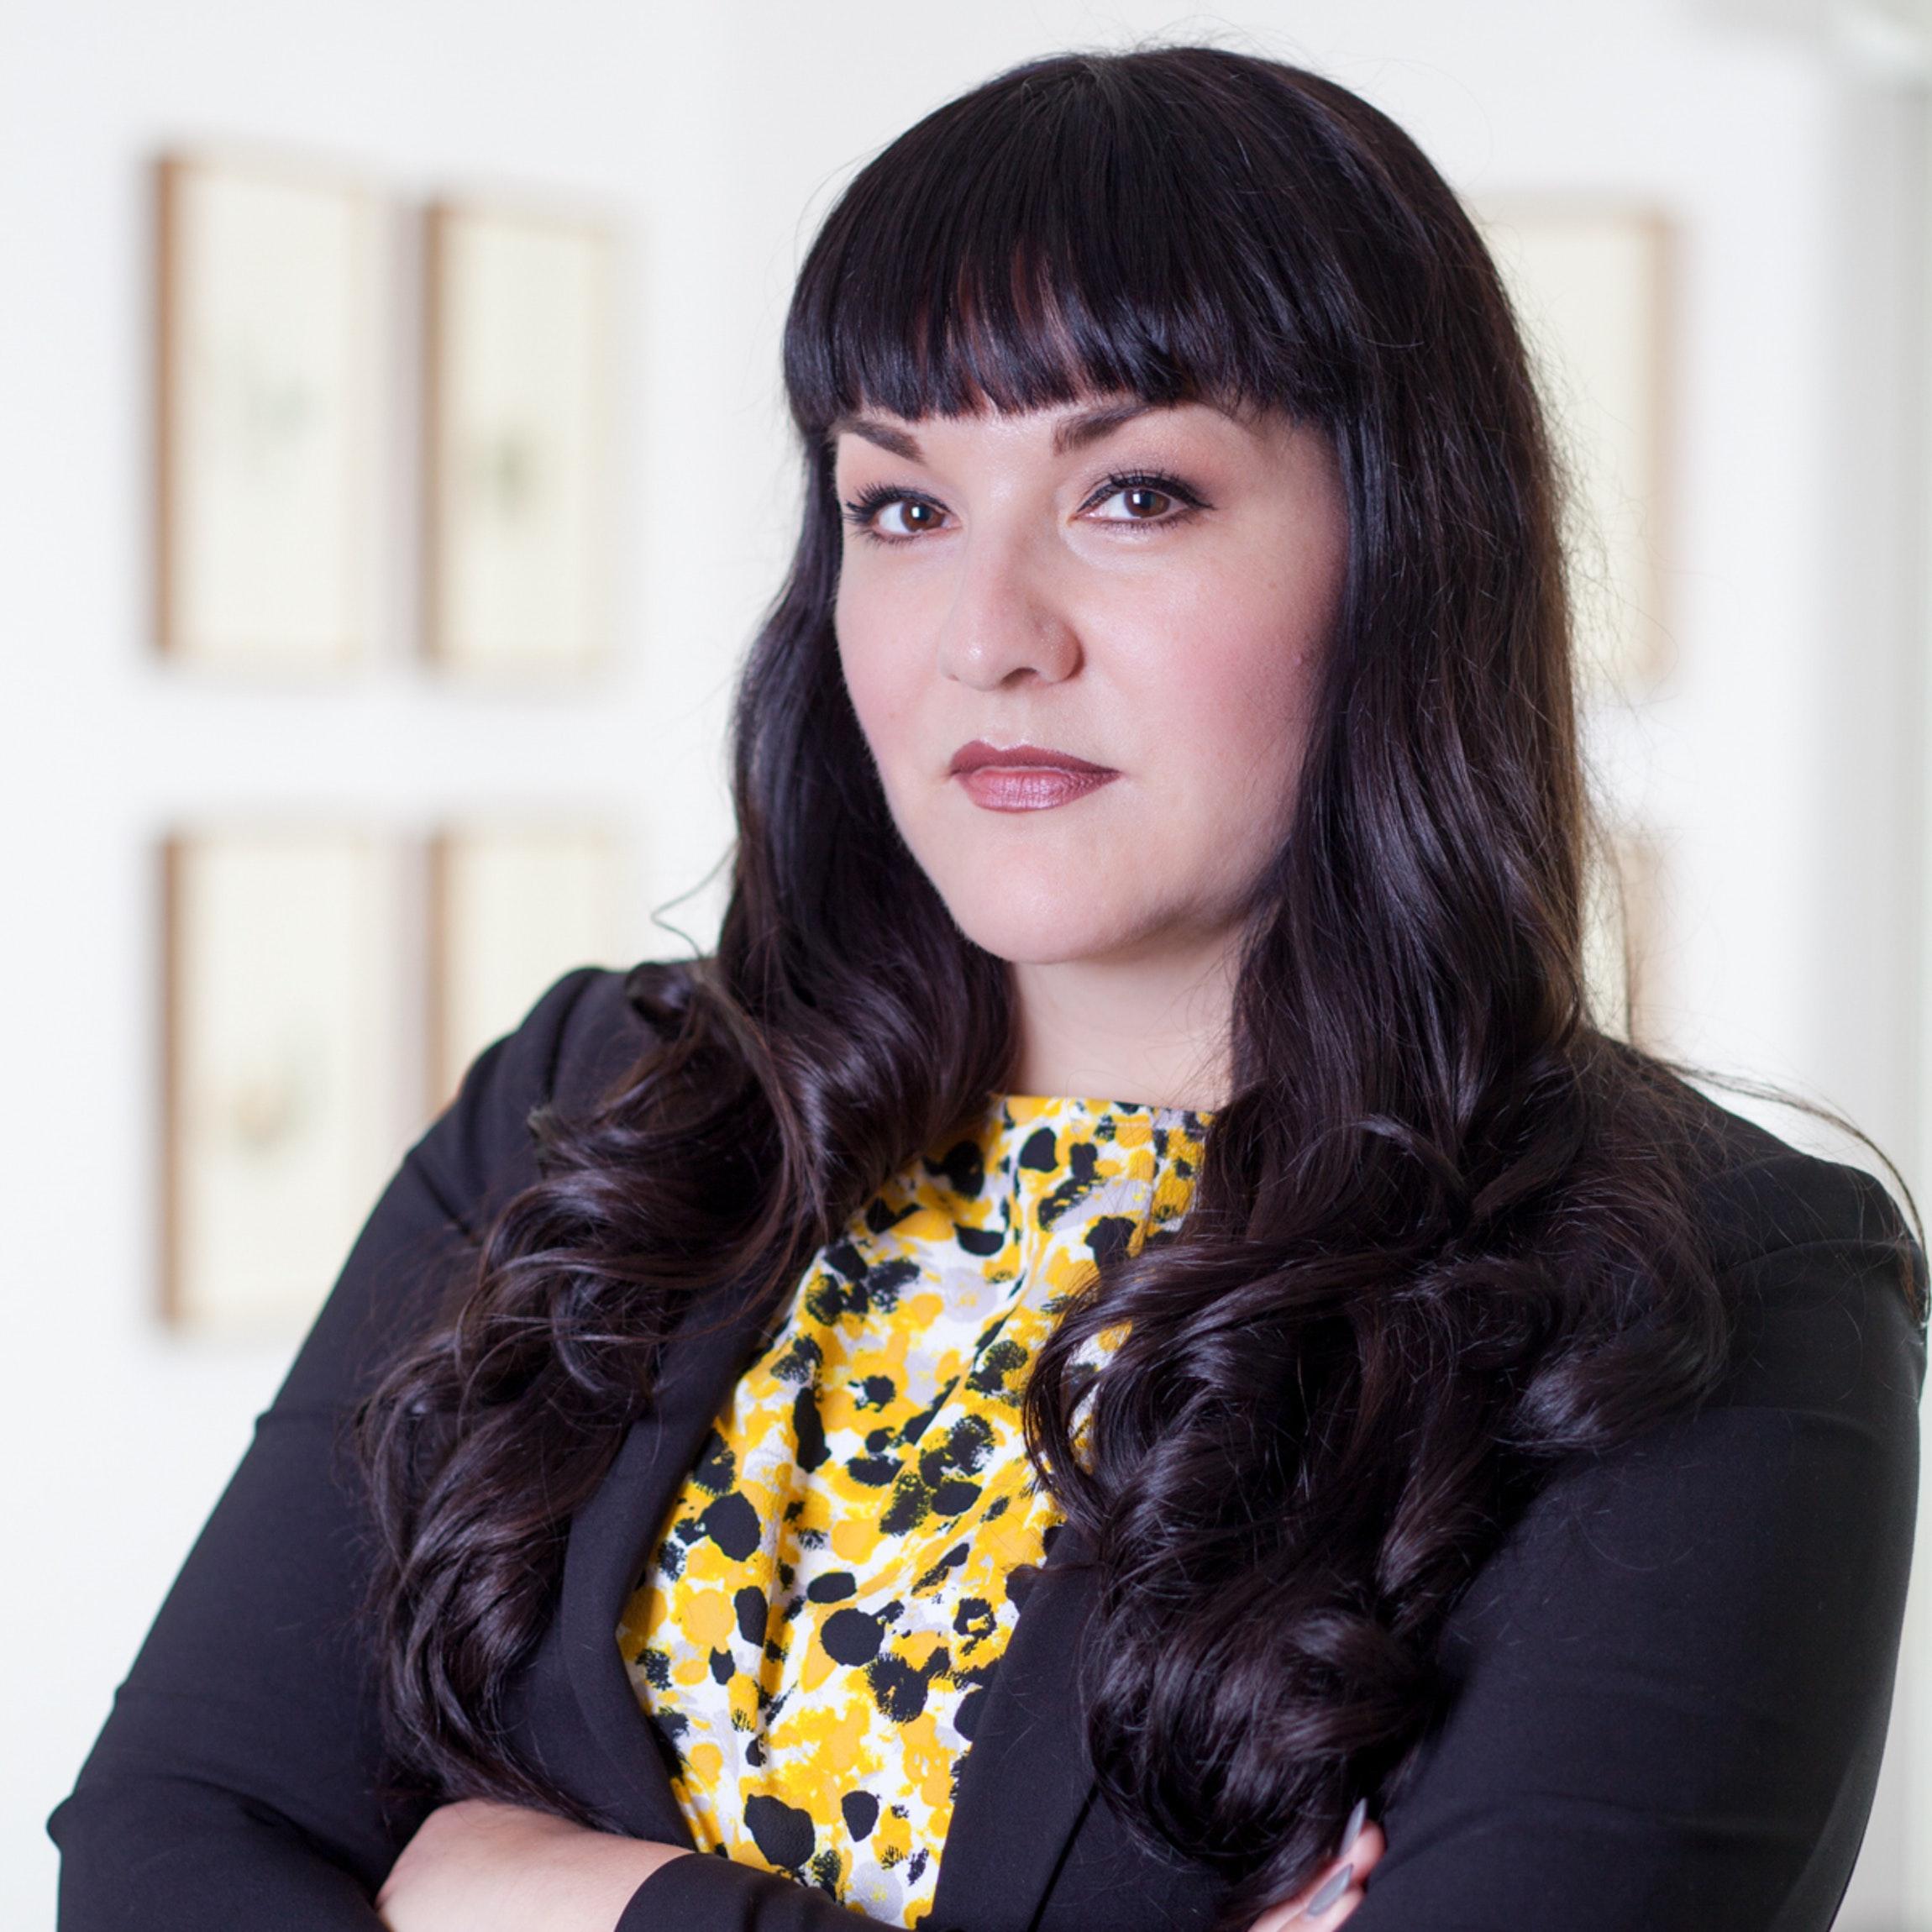 Pilar Tompkins Rivas. Photo by Rafa Cardenas.